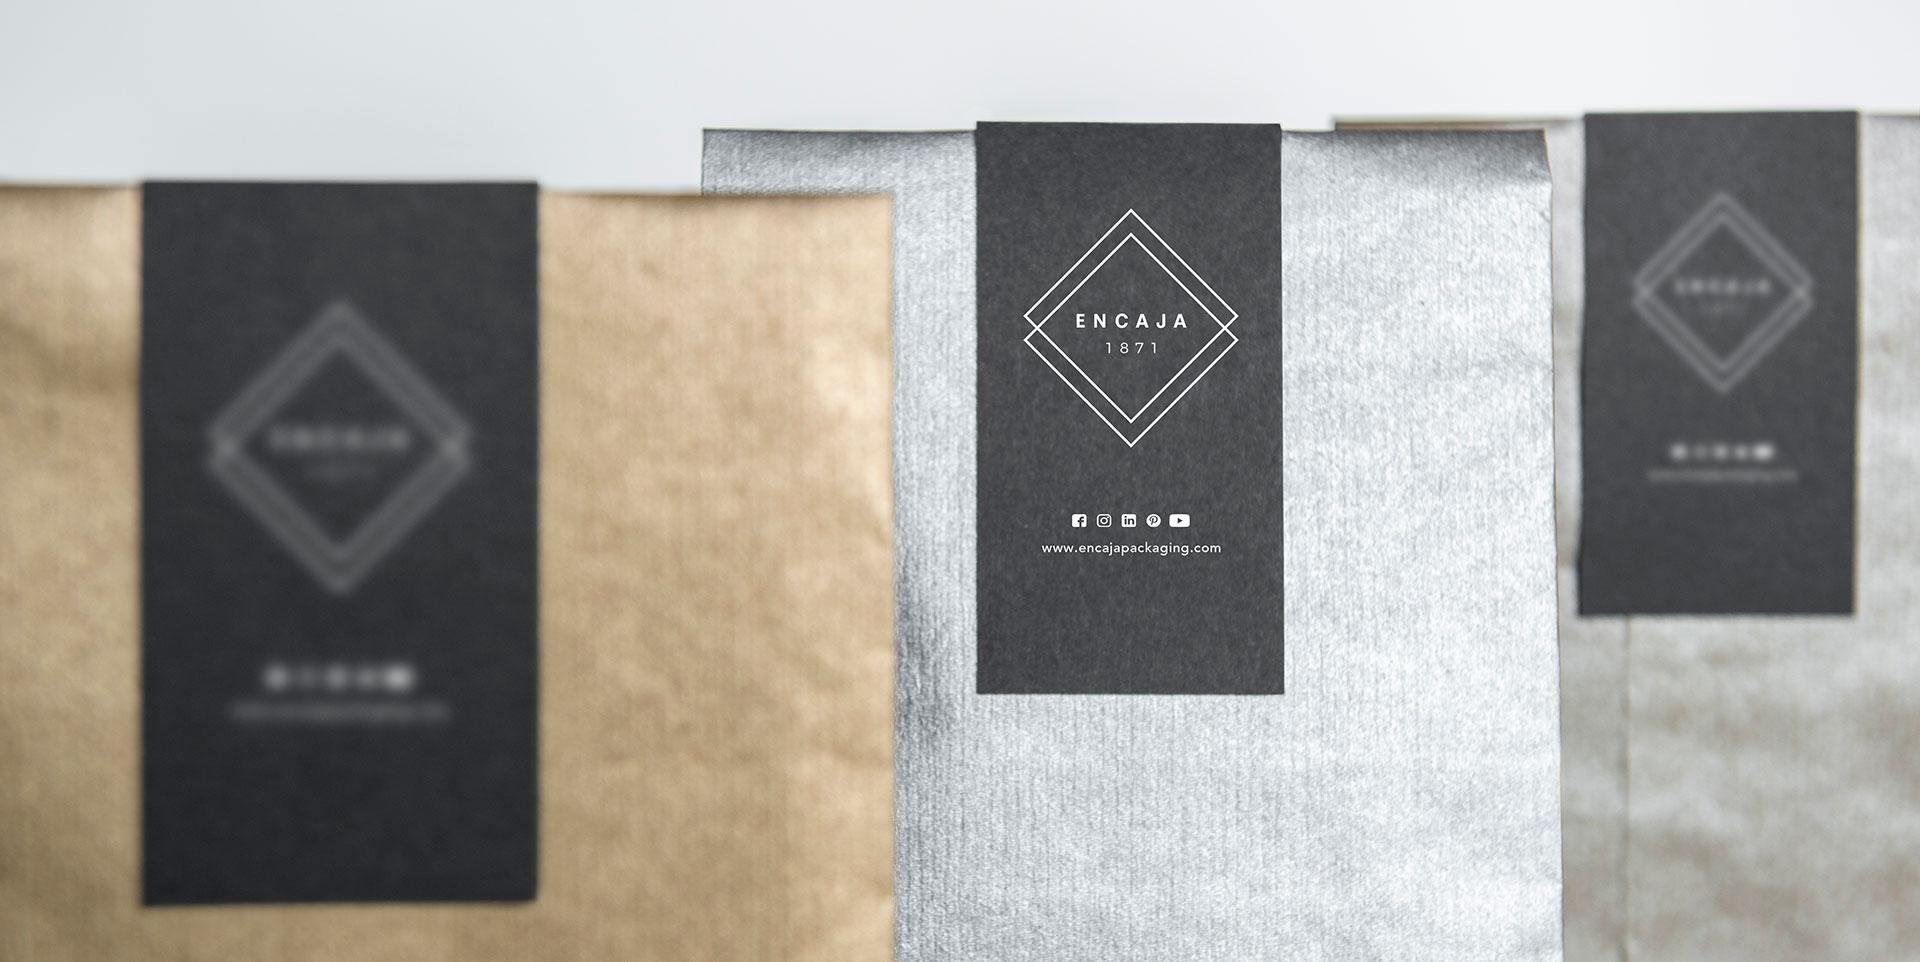 complementos-para-packaging-cintas-papeles-2.jpg